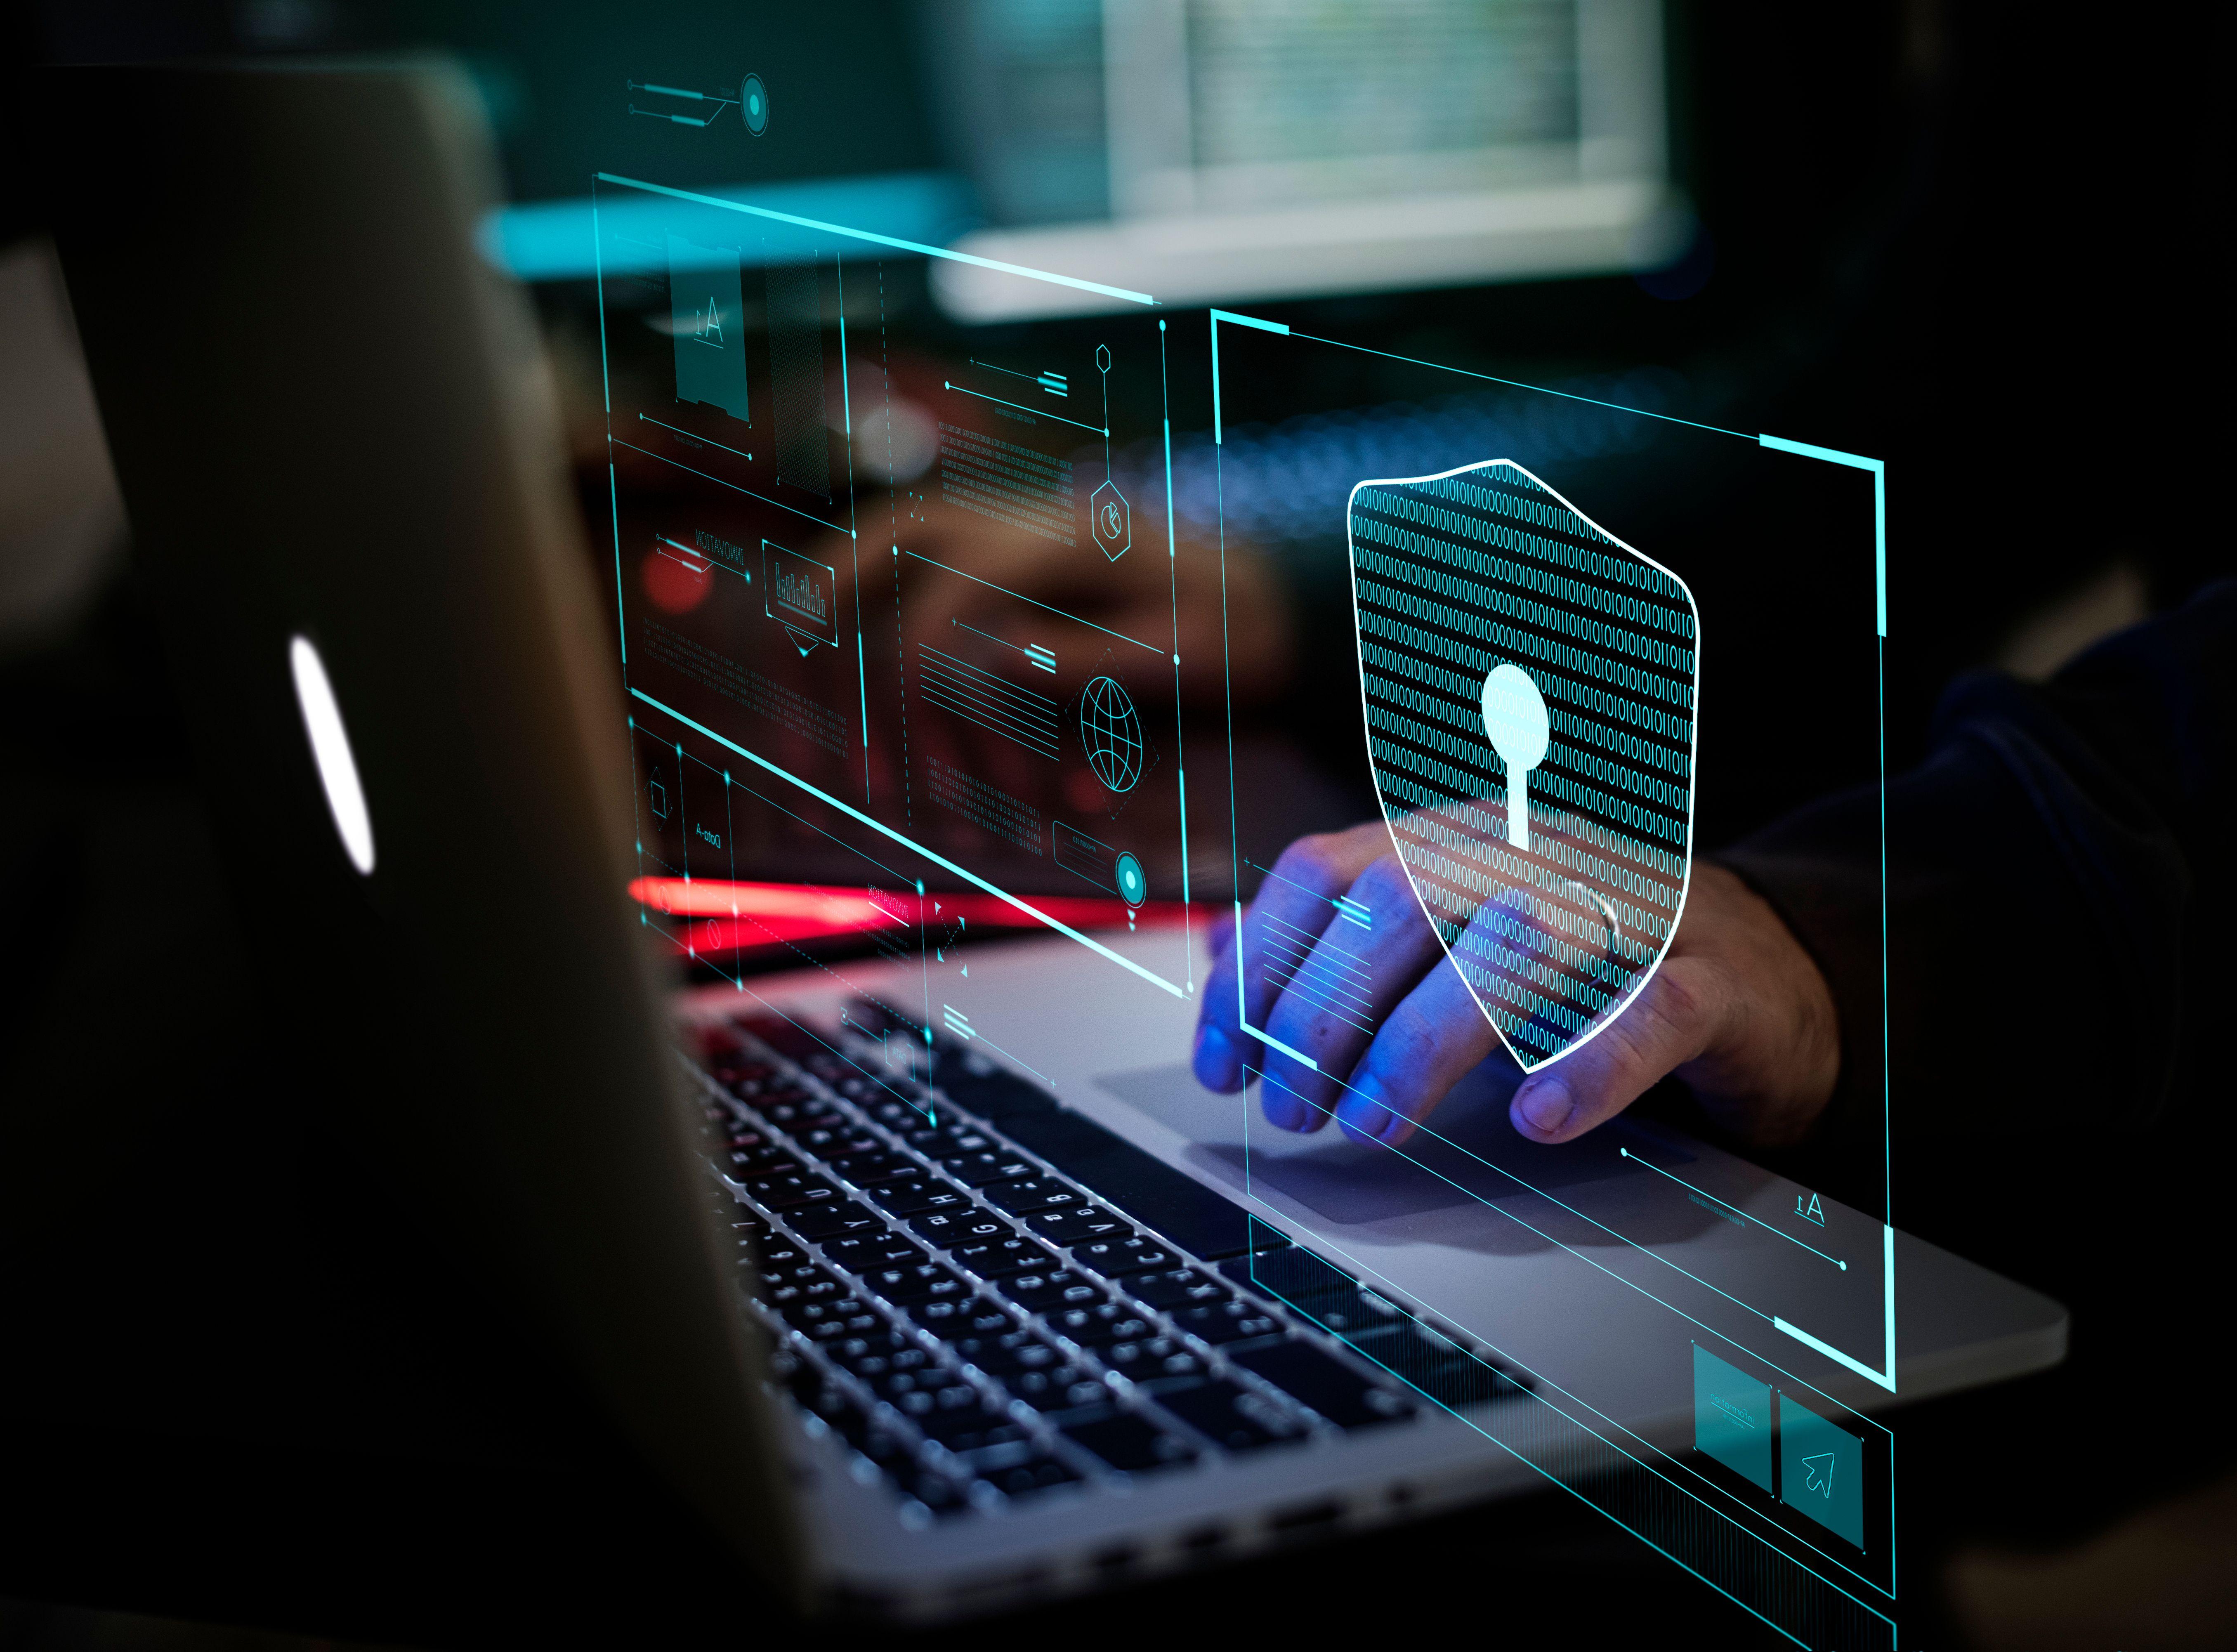 /bidens-administration-reinforces-cyber-security-protocols-of-powergrid-pl1u35va feature image